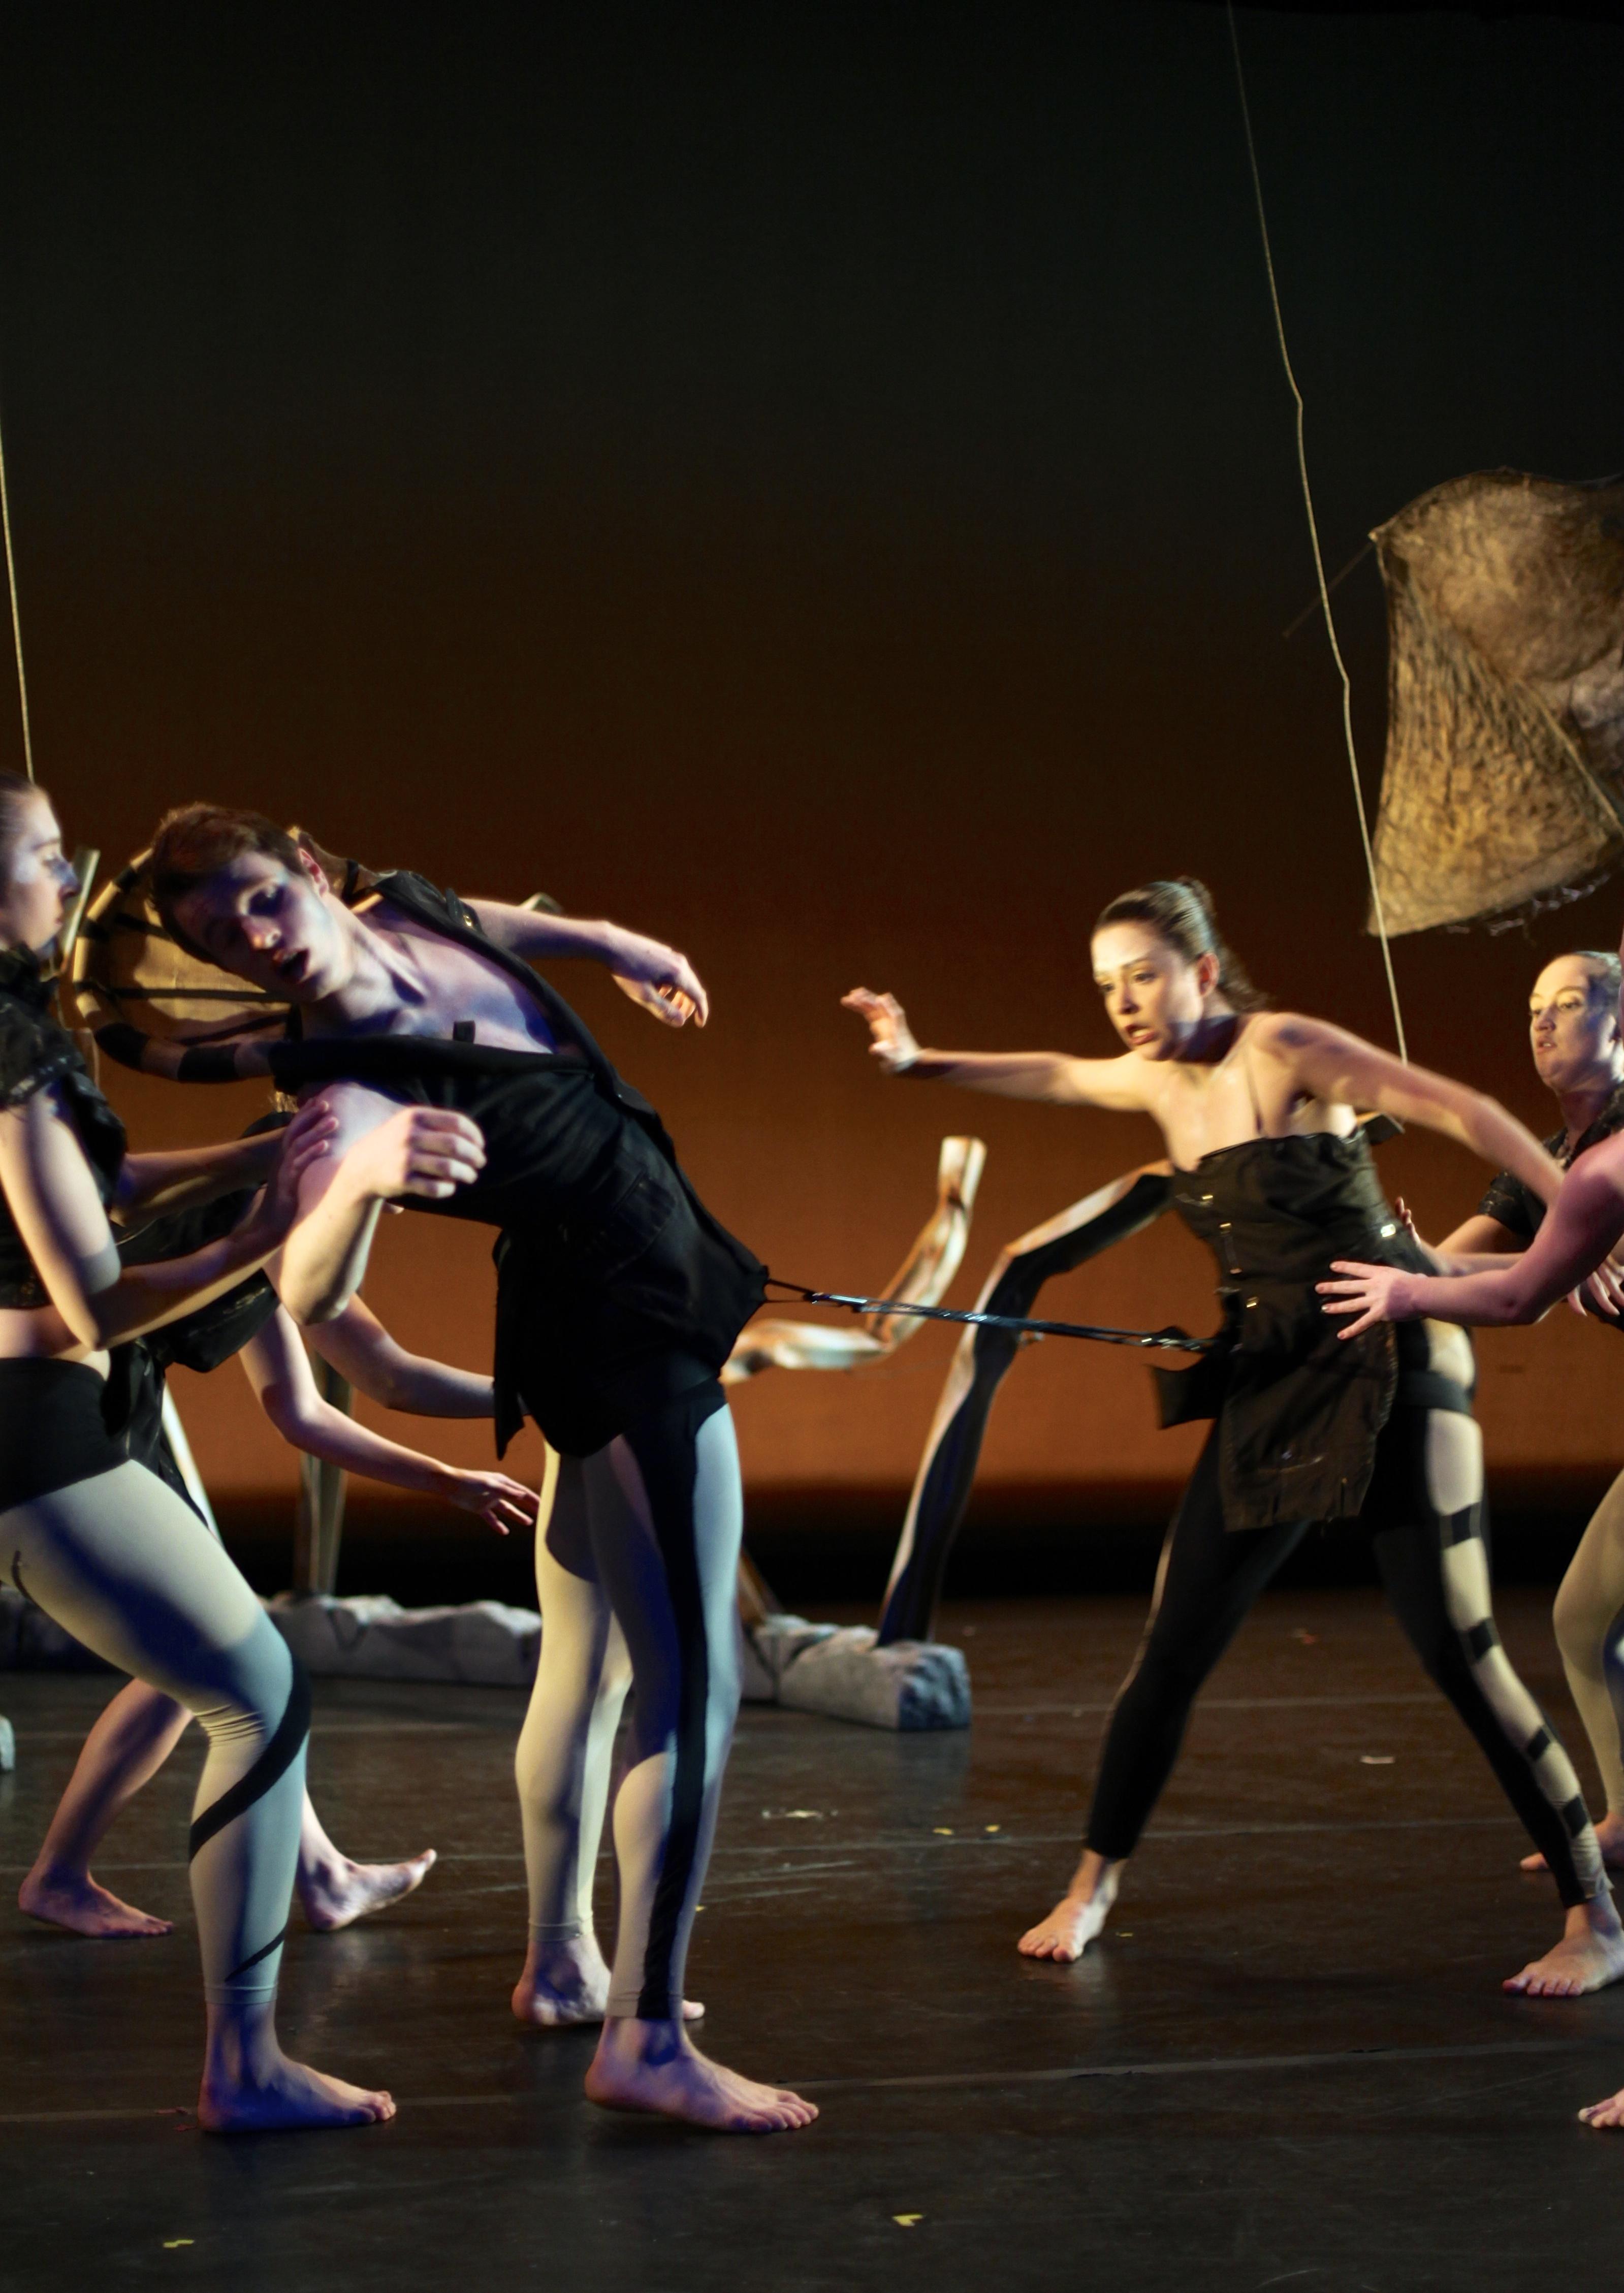 Tamara_Design_Scrap_Dance_NYU_6